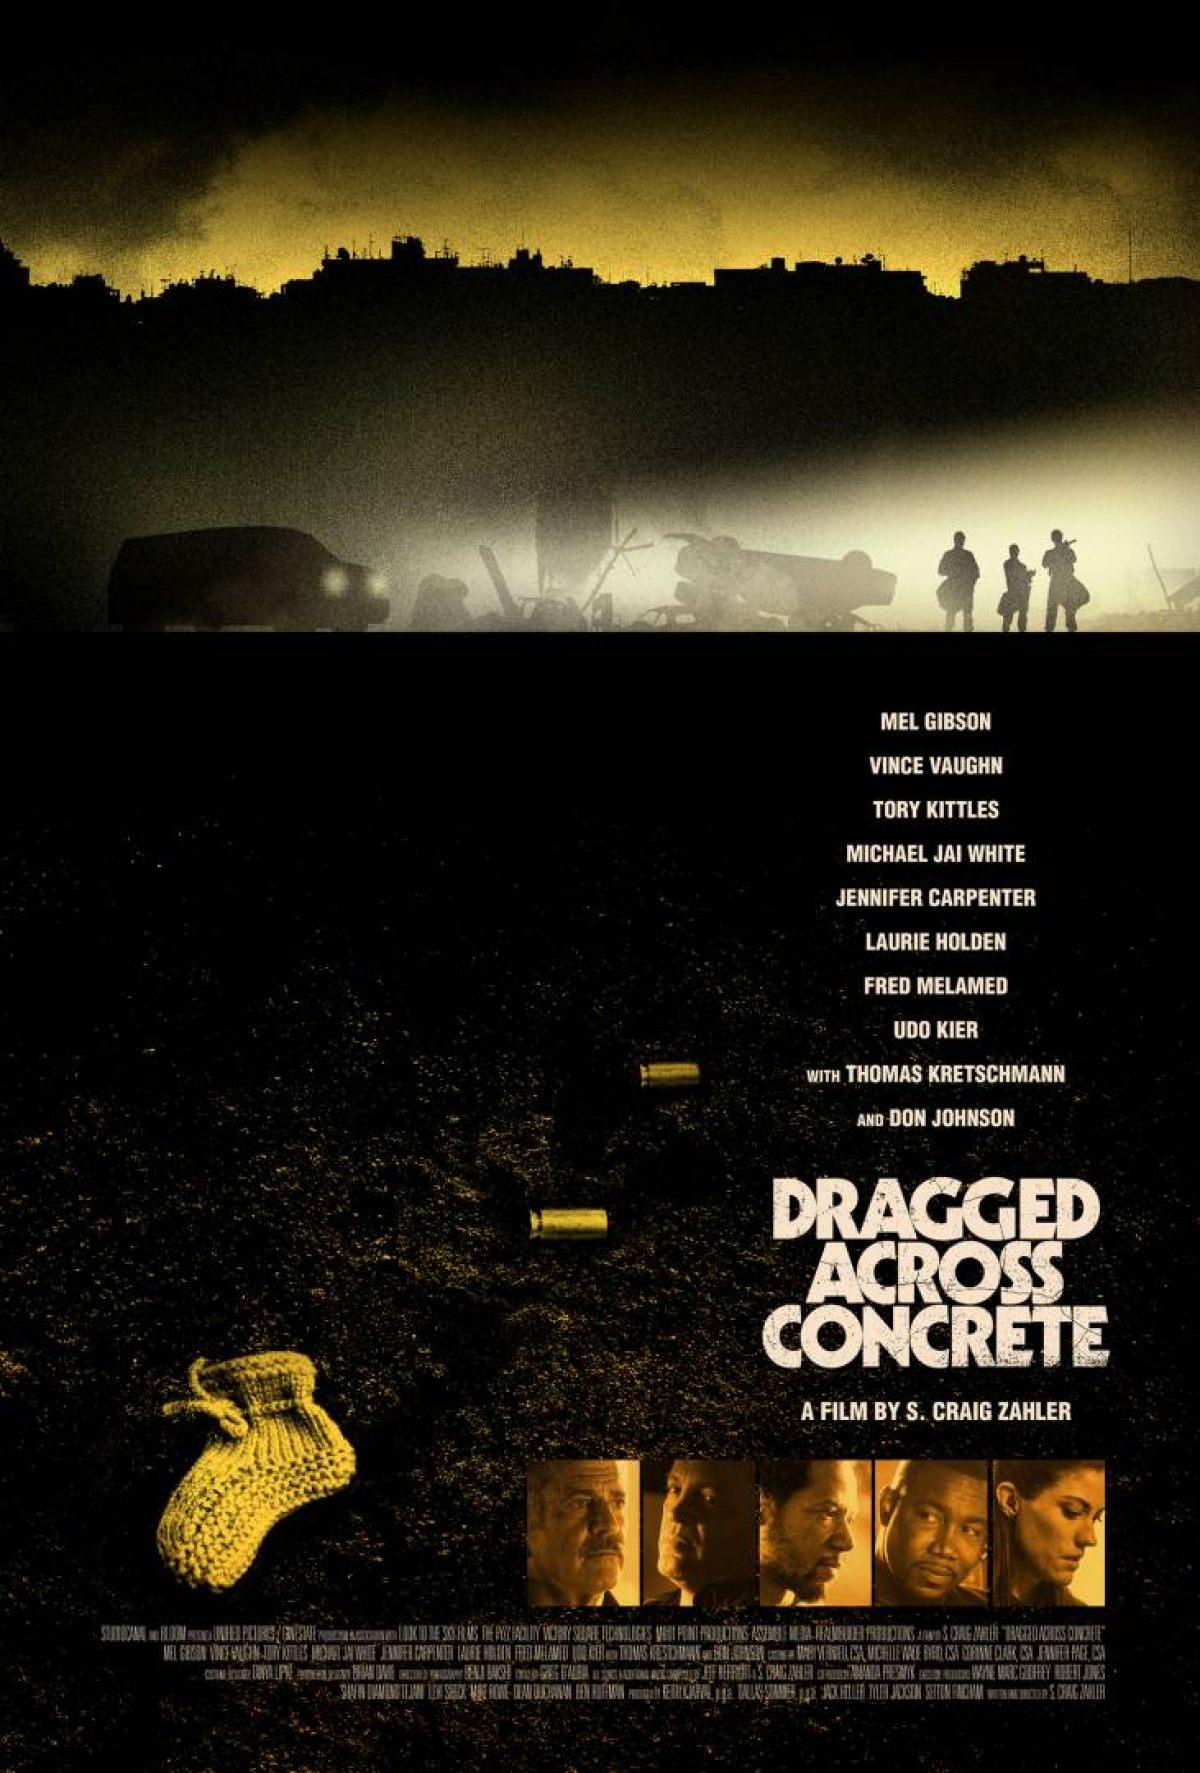 Dragged_Across_Concrete_UK_Poster_1200_1773_81_s.jpg